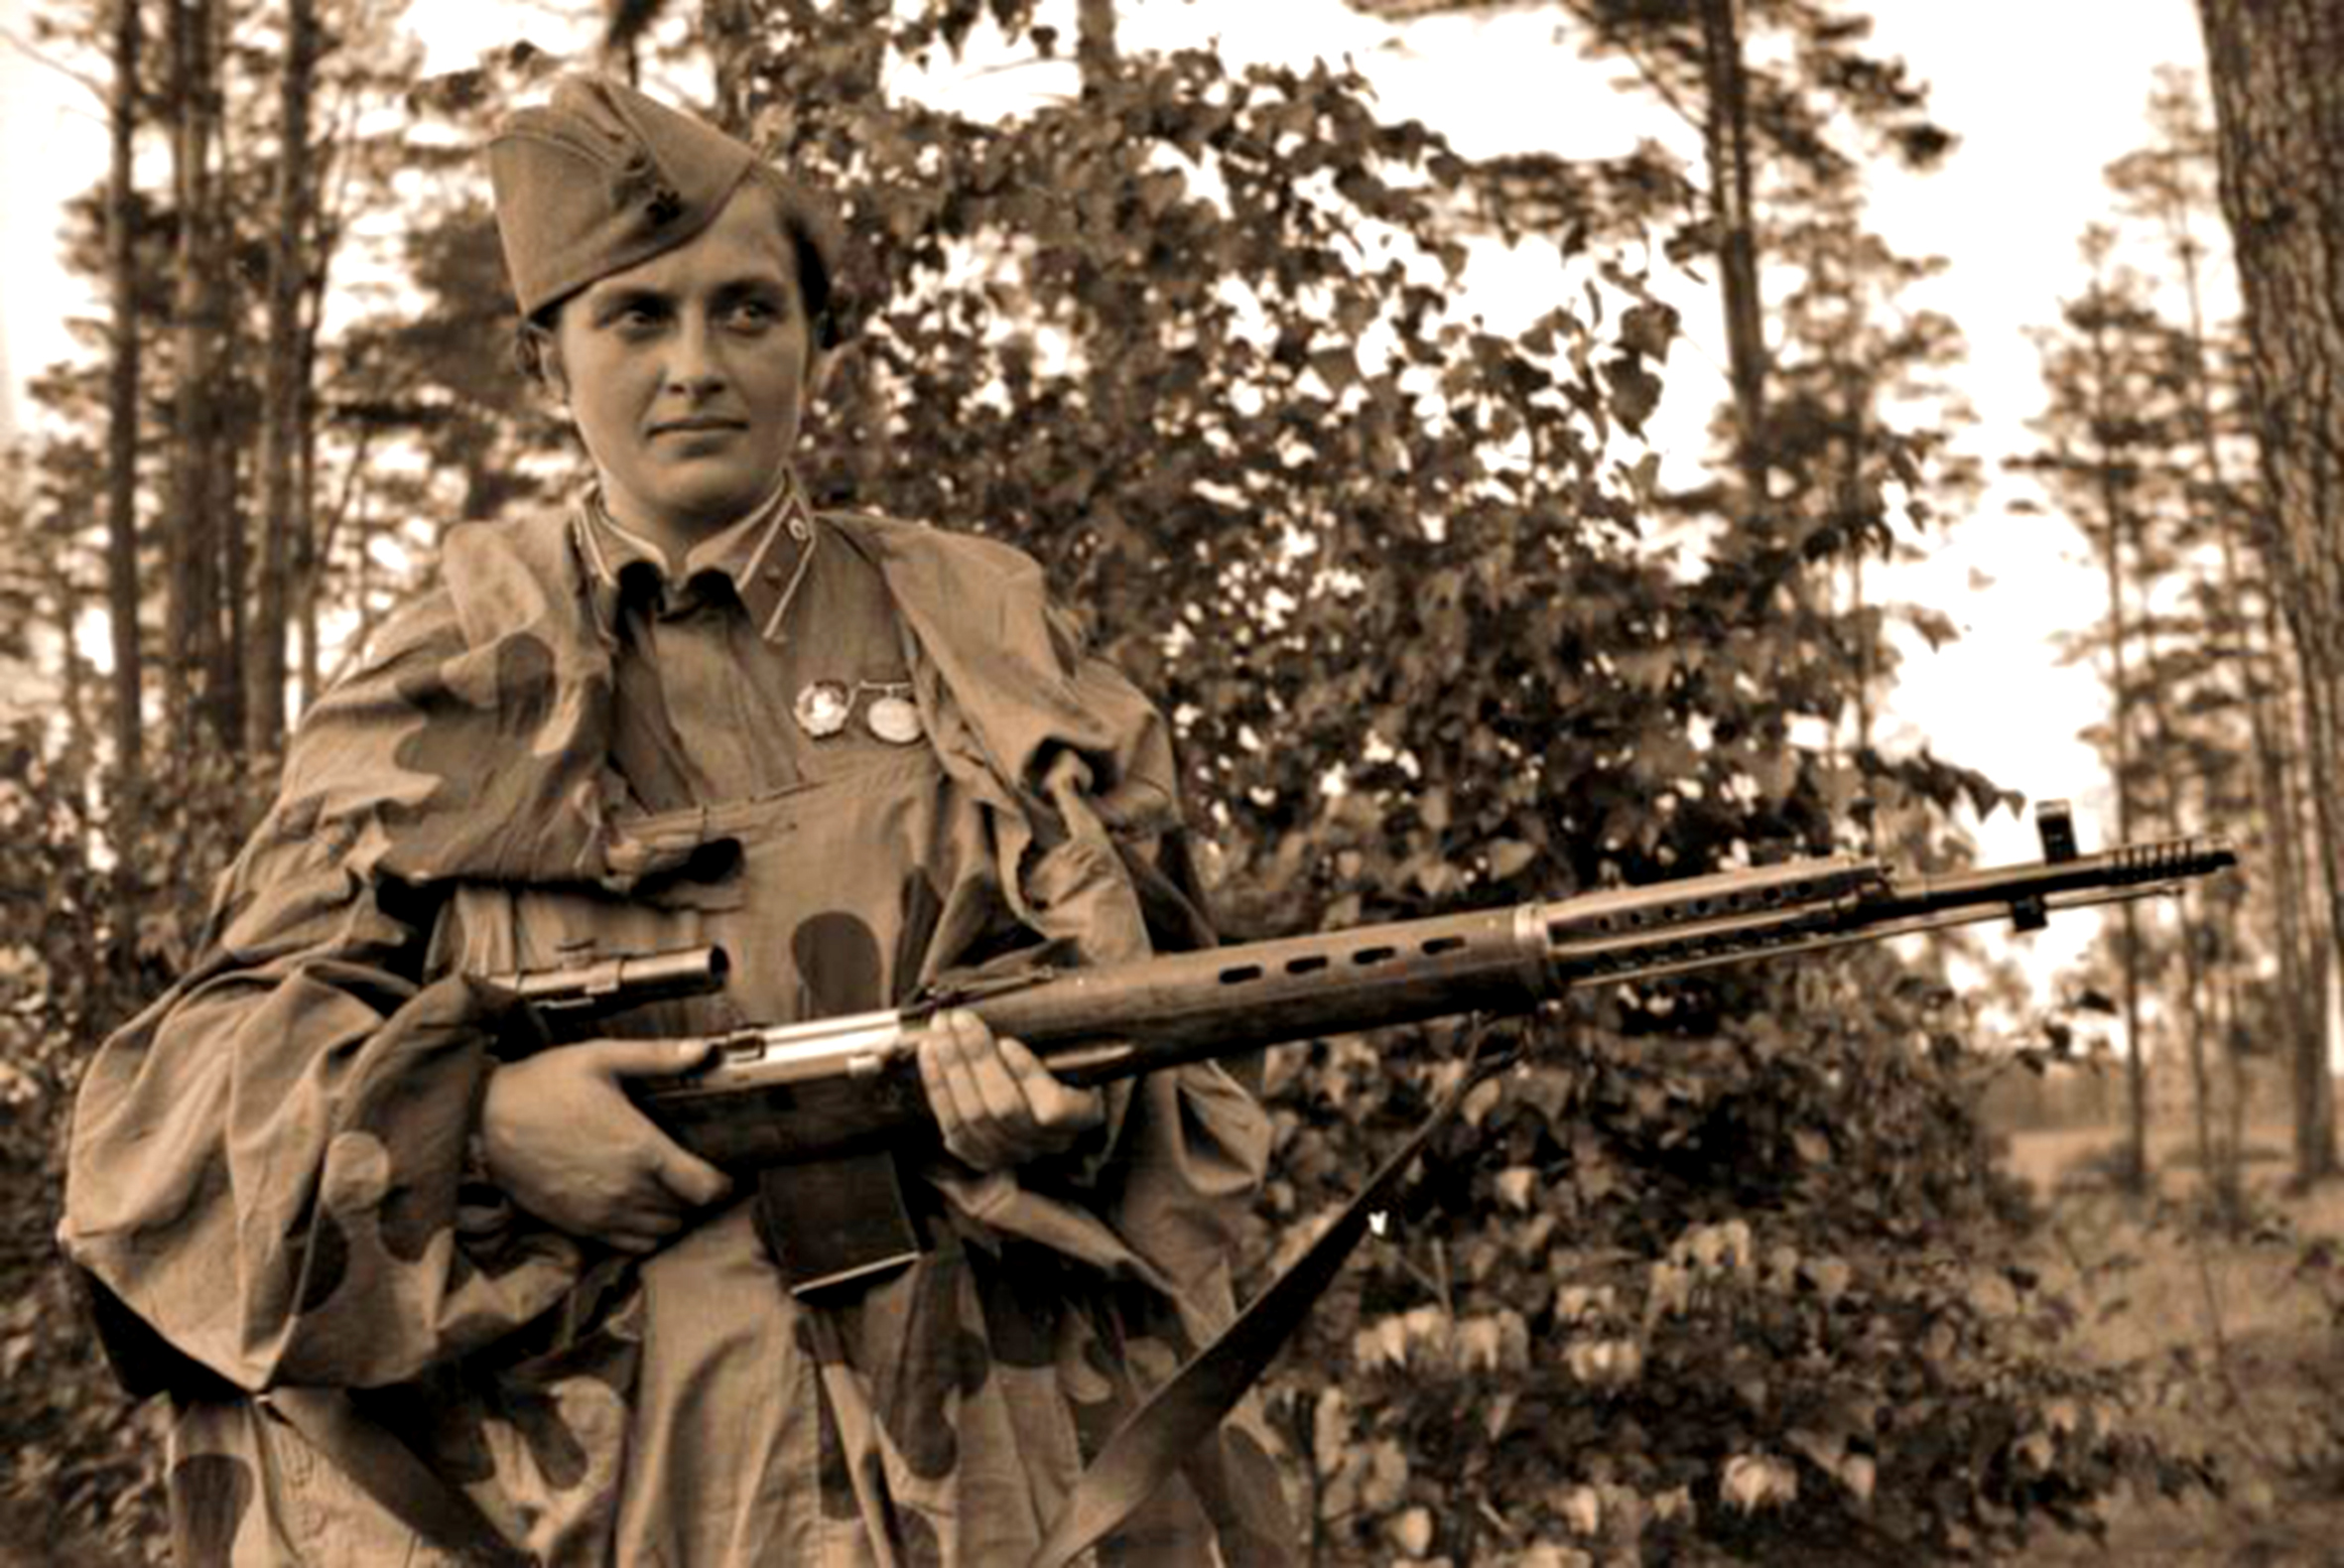 Павлюченко людмила снайпер дети фото